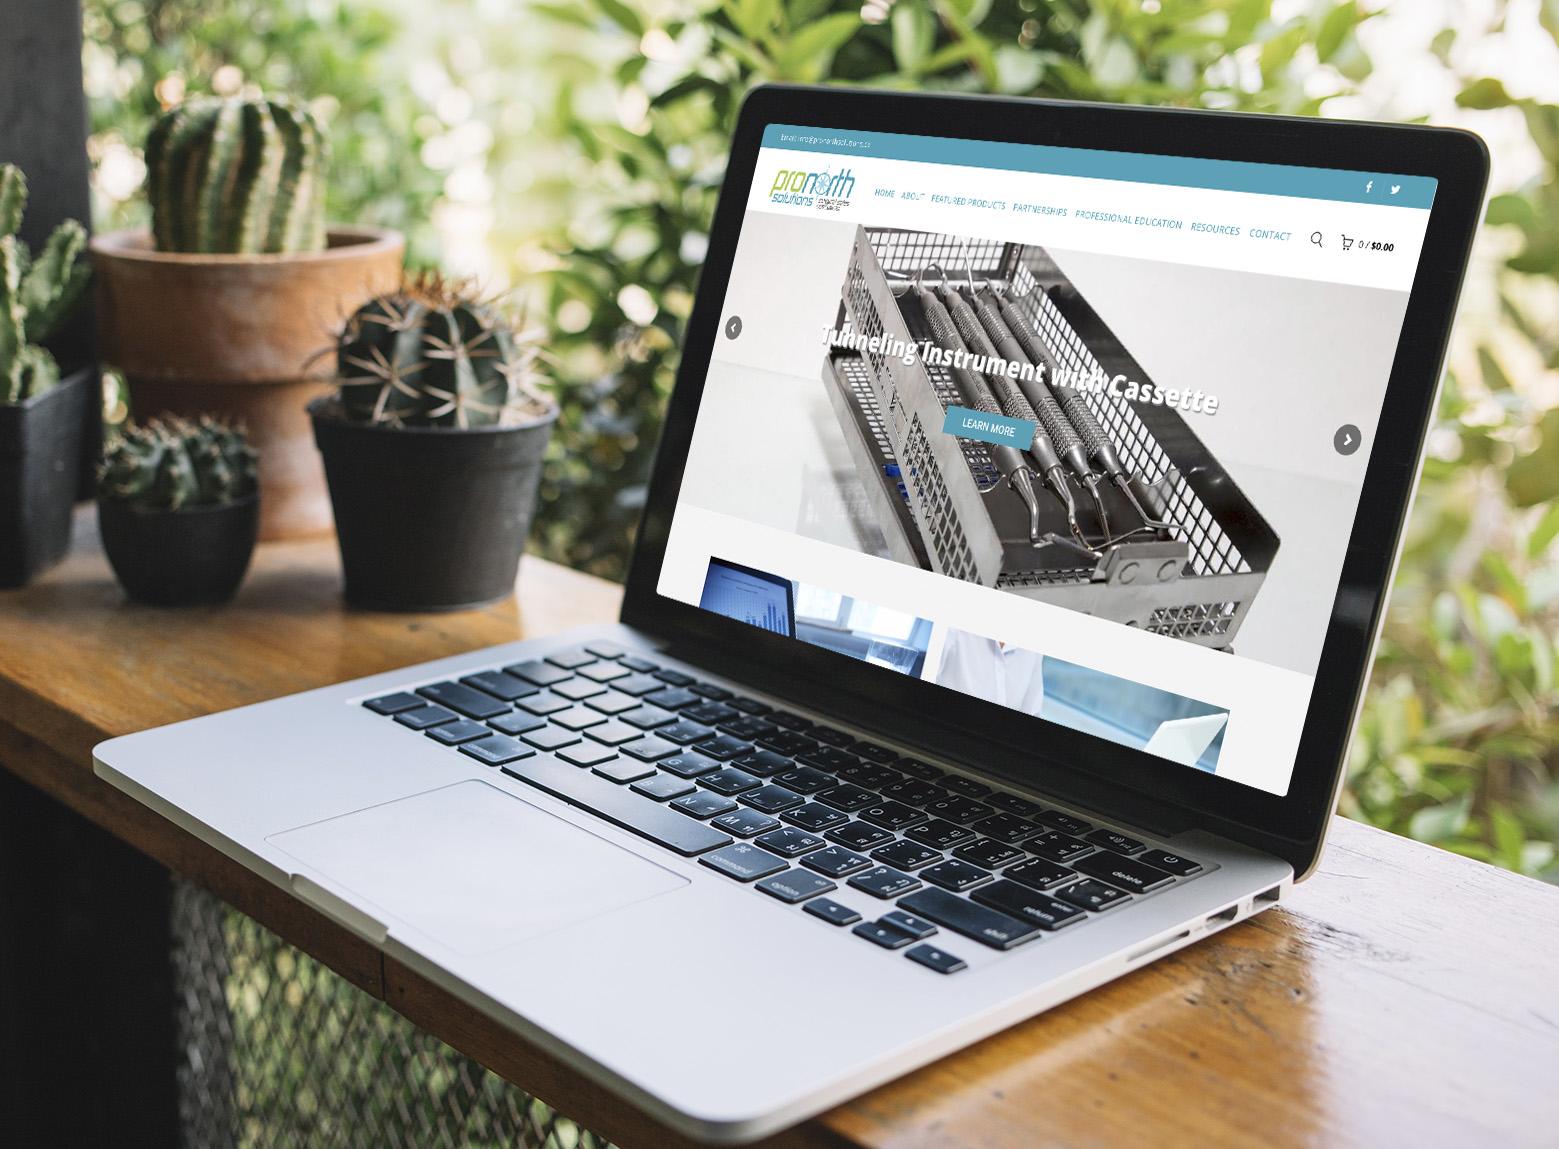 Laptop ukazujúci webstránku ProNorth vytvorenú firmou IdeaMarketing.sk